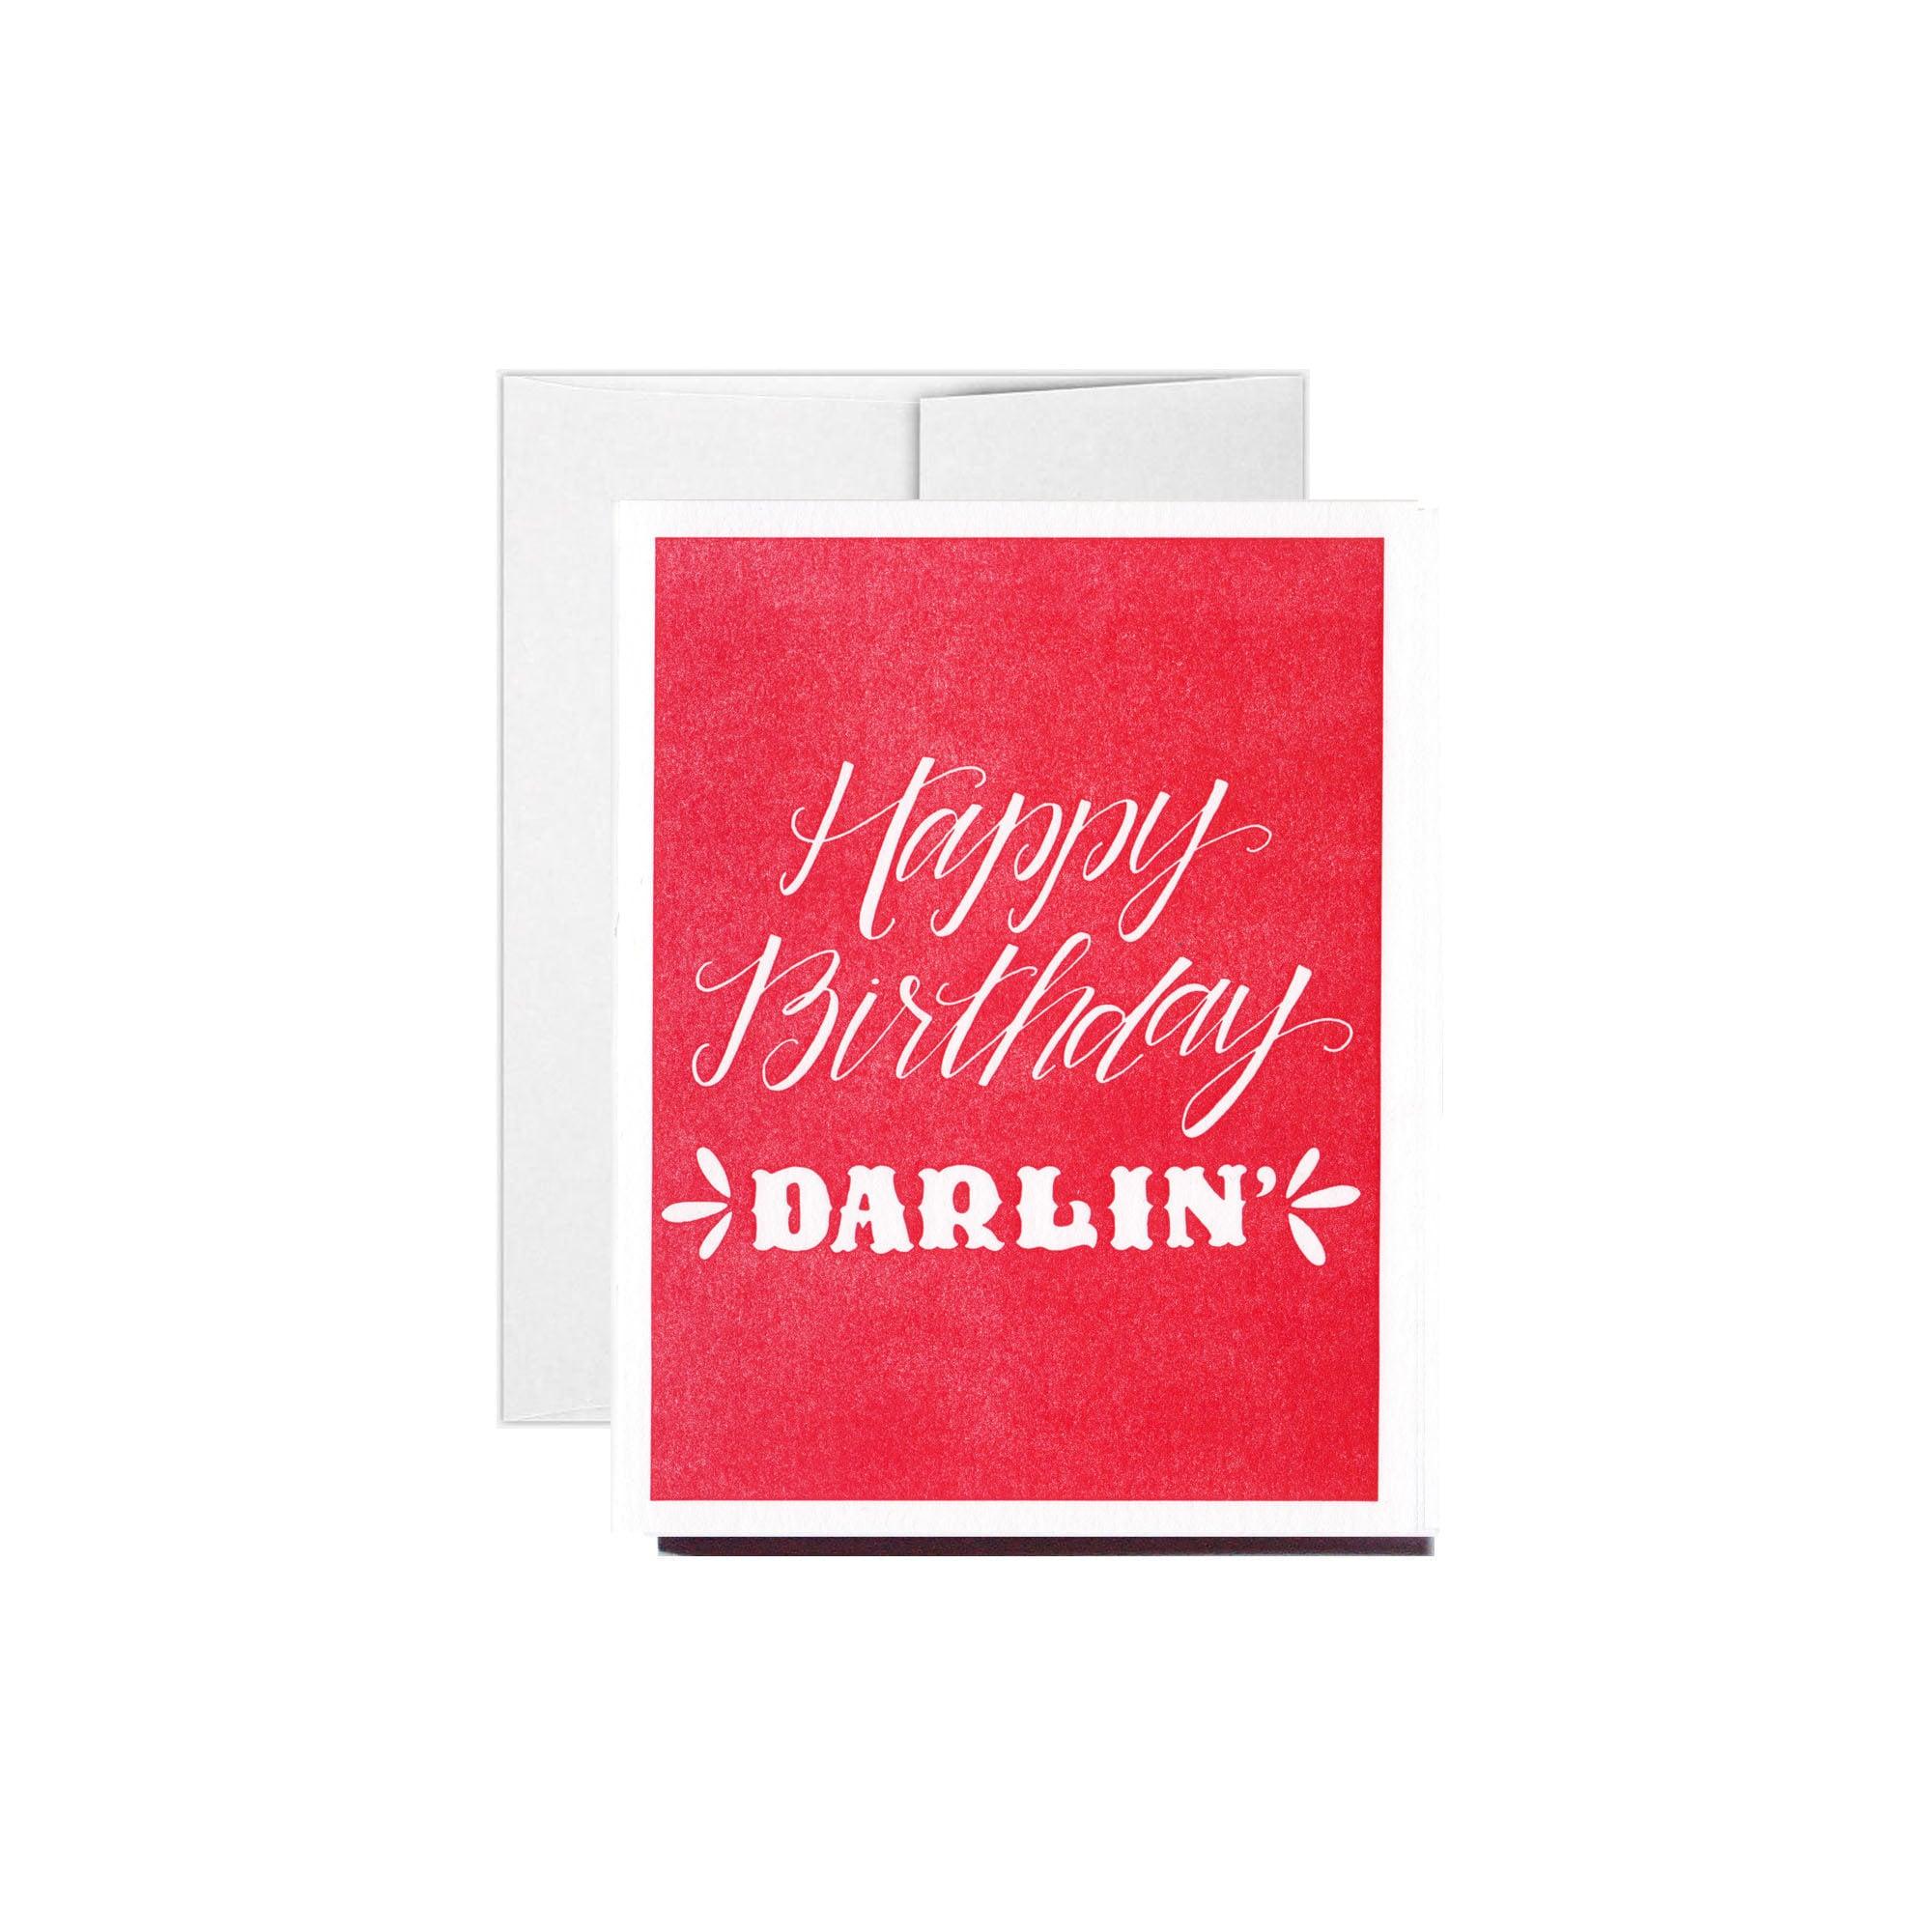 Letterpress Happy Birthday Darlin' Birthday Card